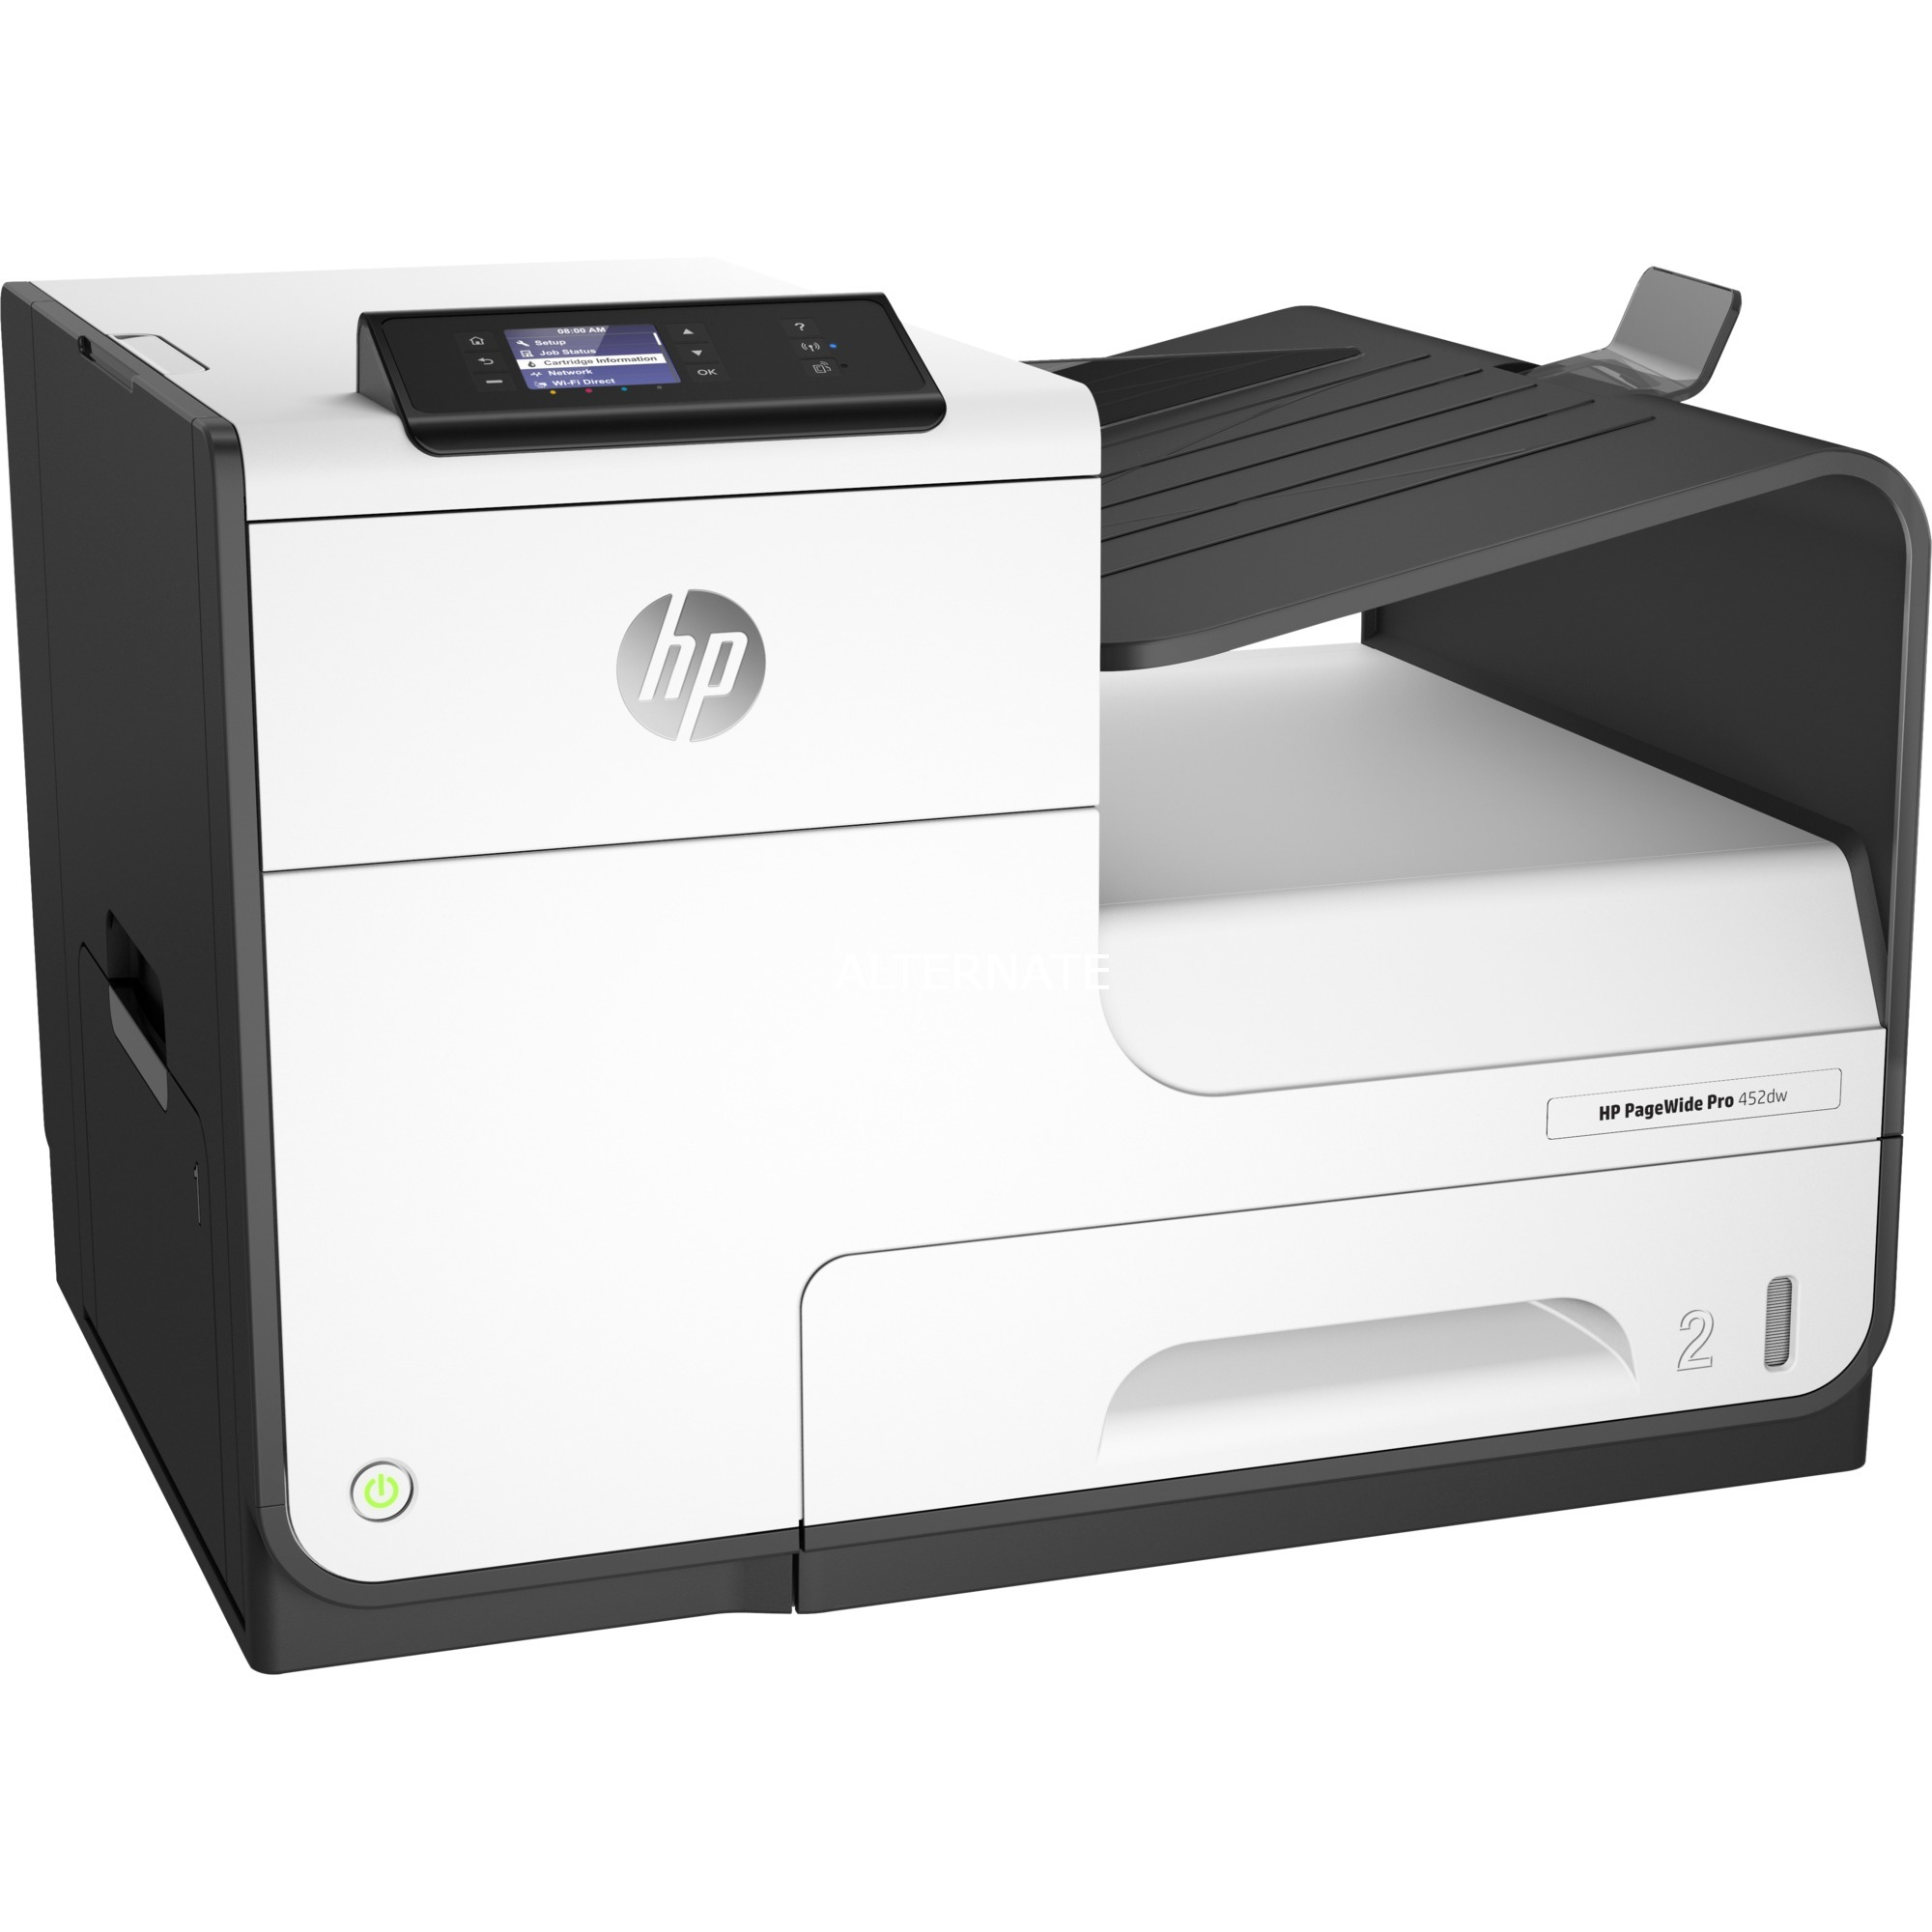 PageWide Pro 452dw, Impresora de chorro de tinta